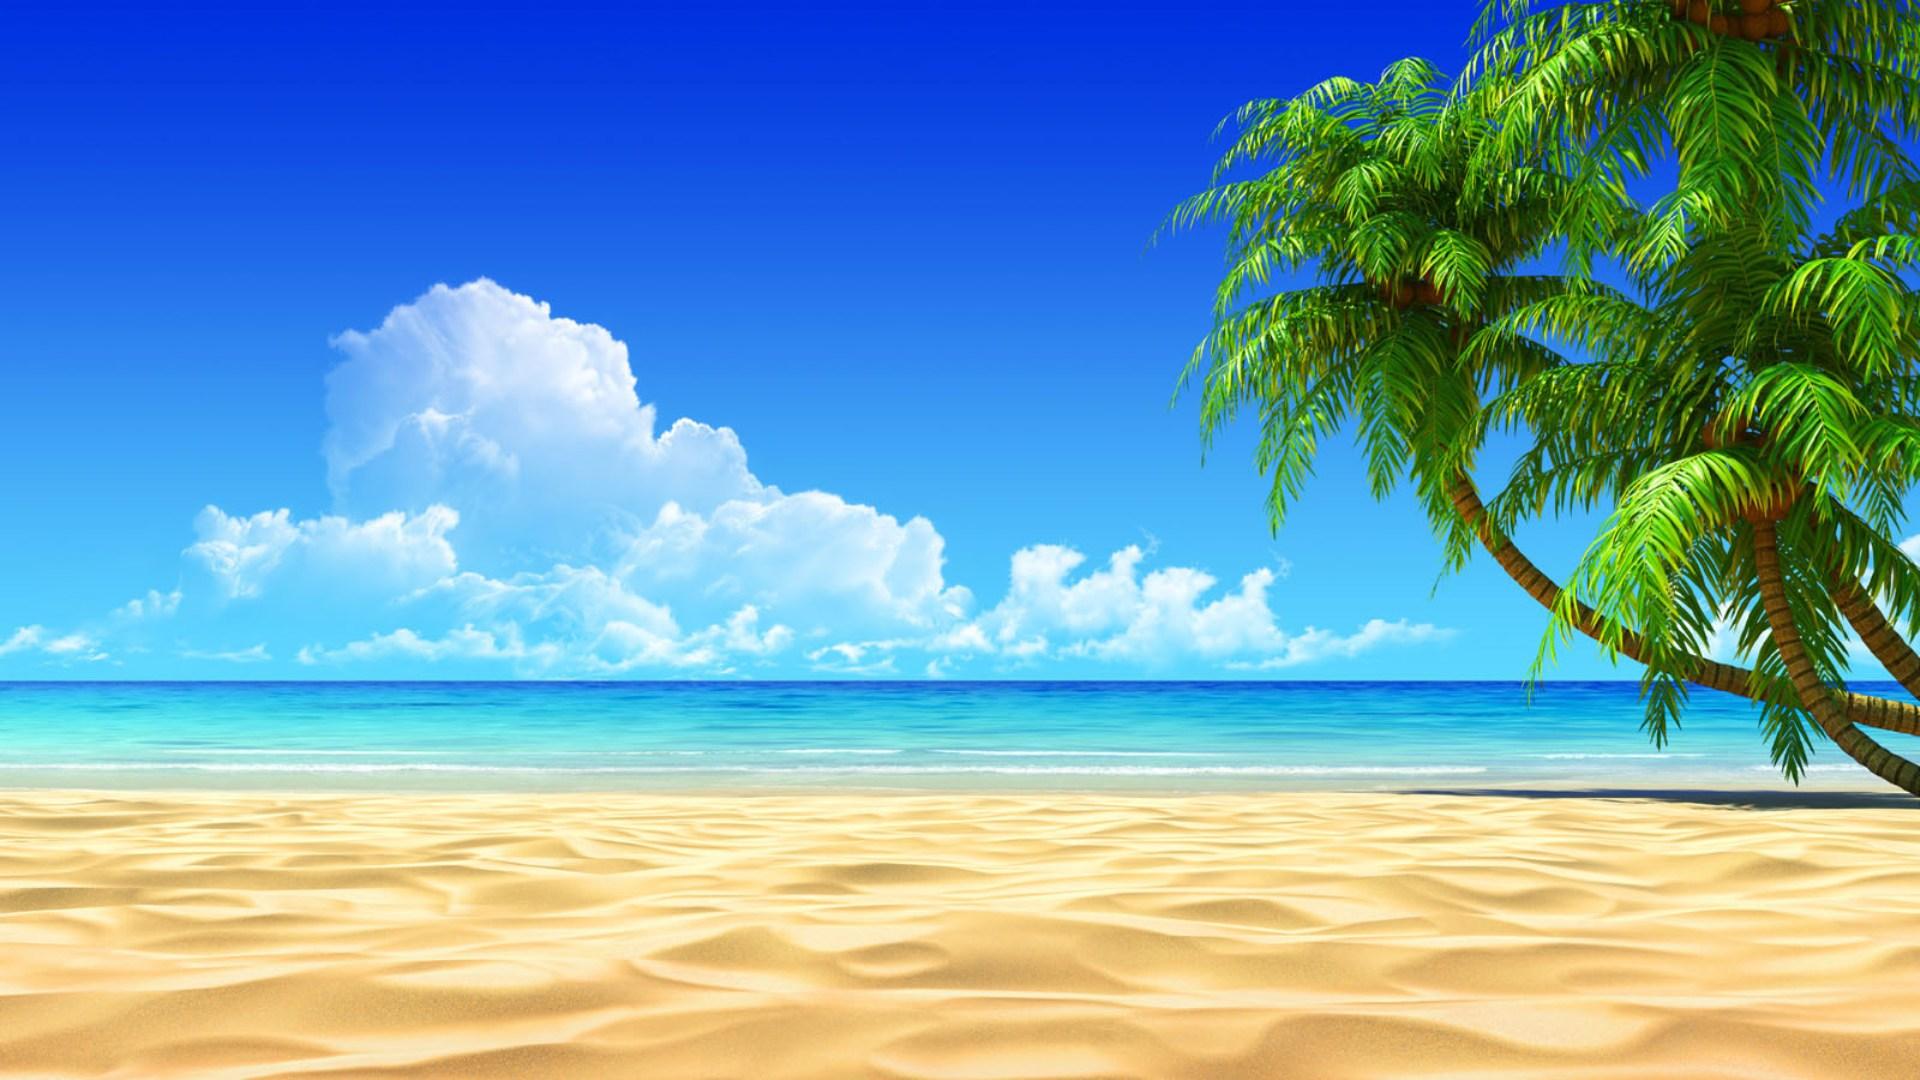 Ipad Wallpaper Beach Scenes: Free Beach Wallpapers And Screensavers